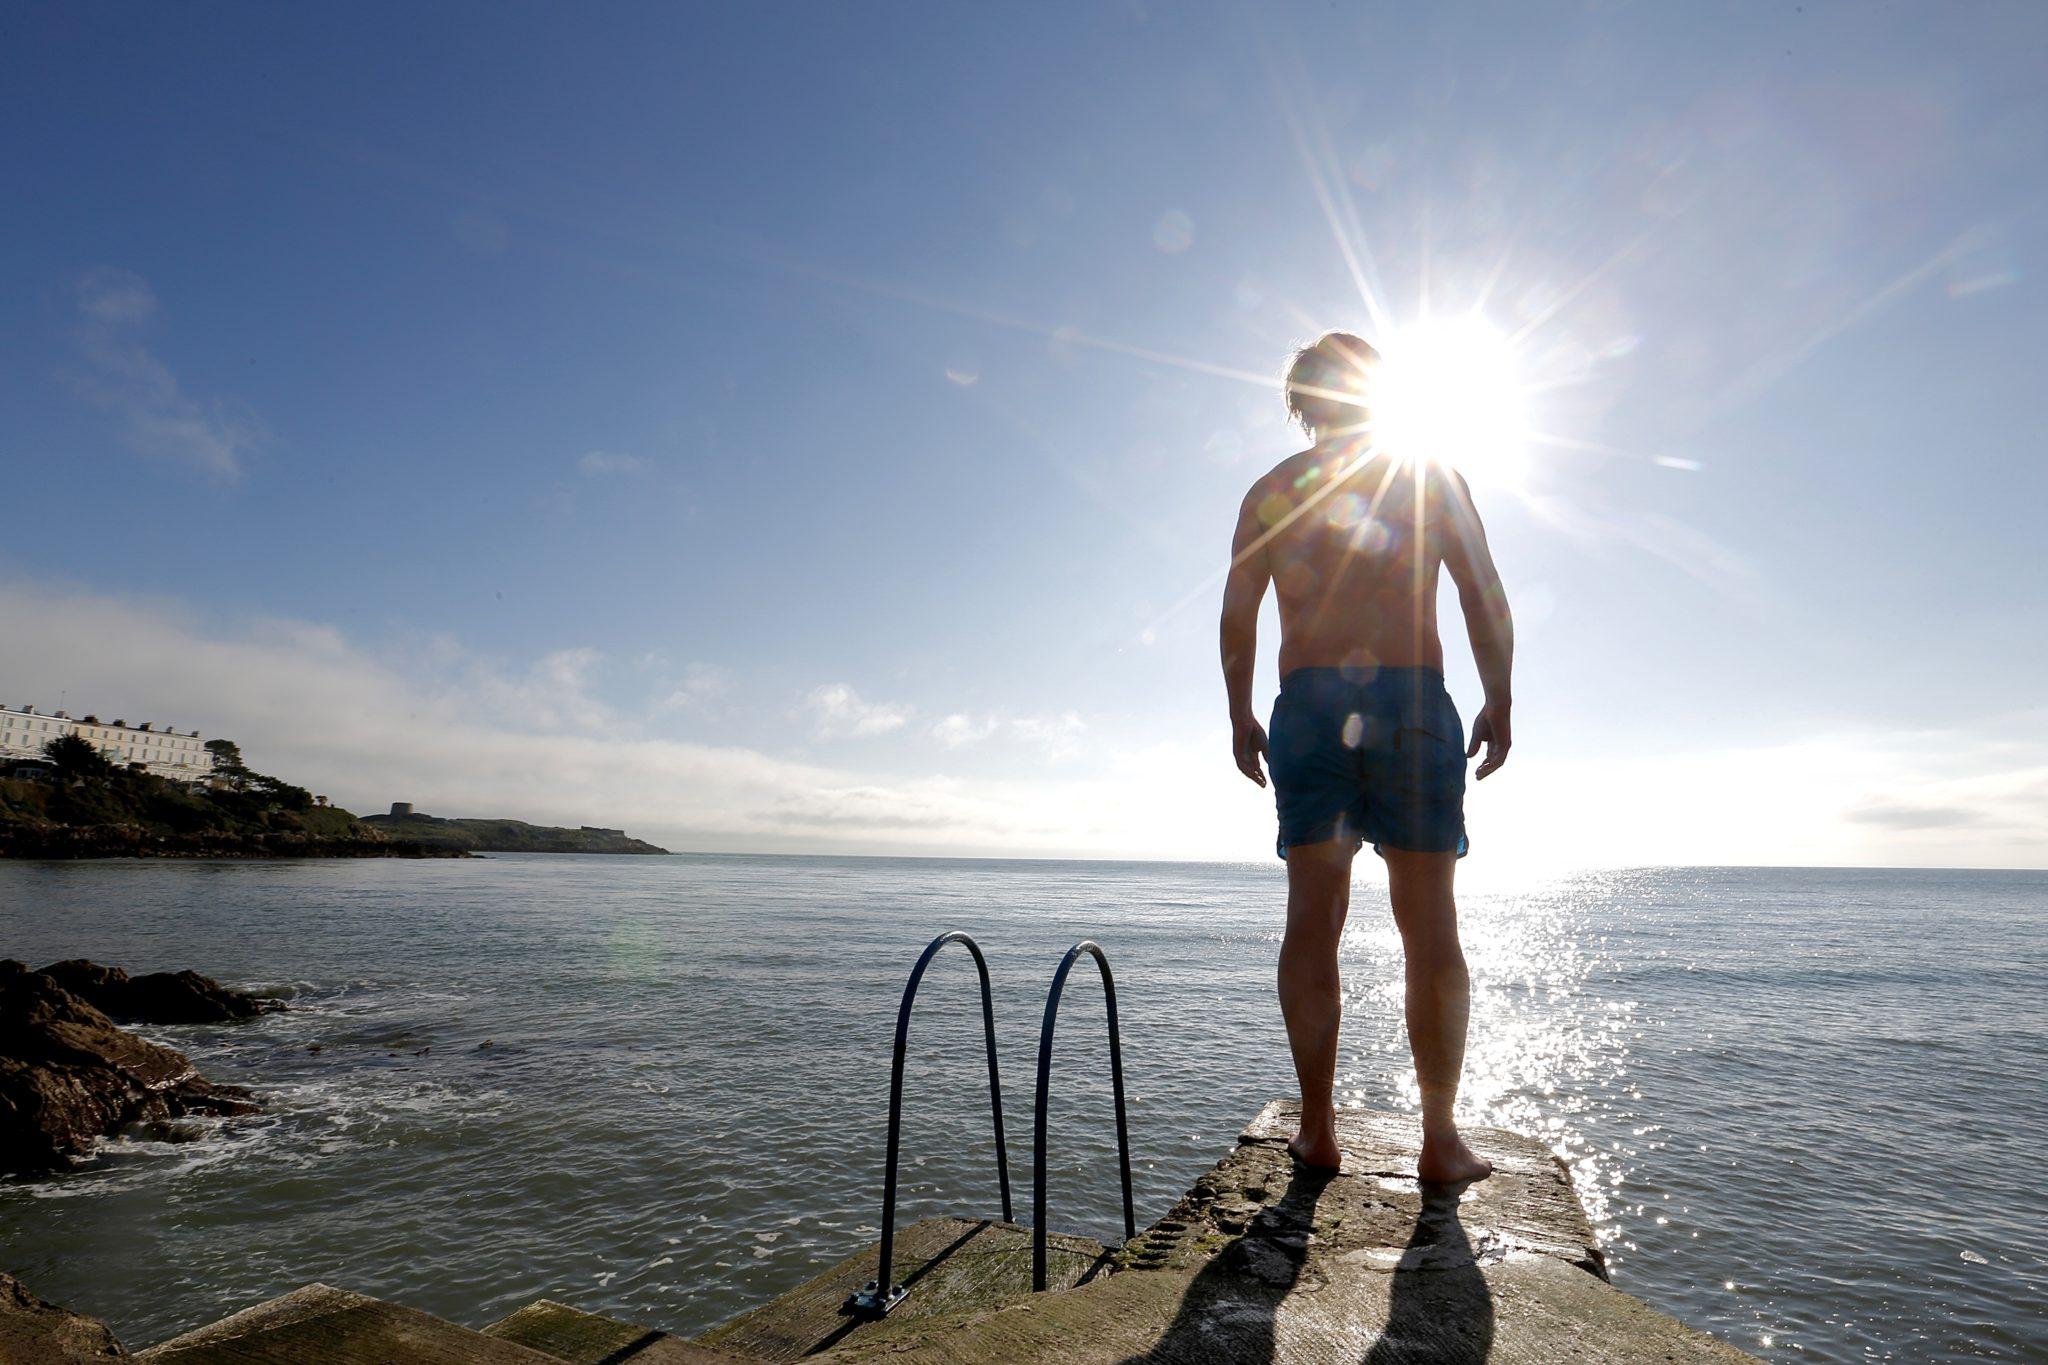 A man preparing to enter the sea at Vico Road in Dublin